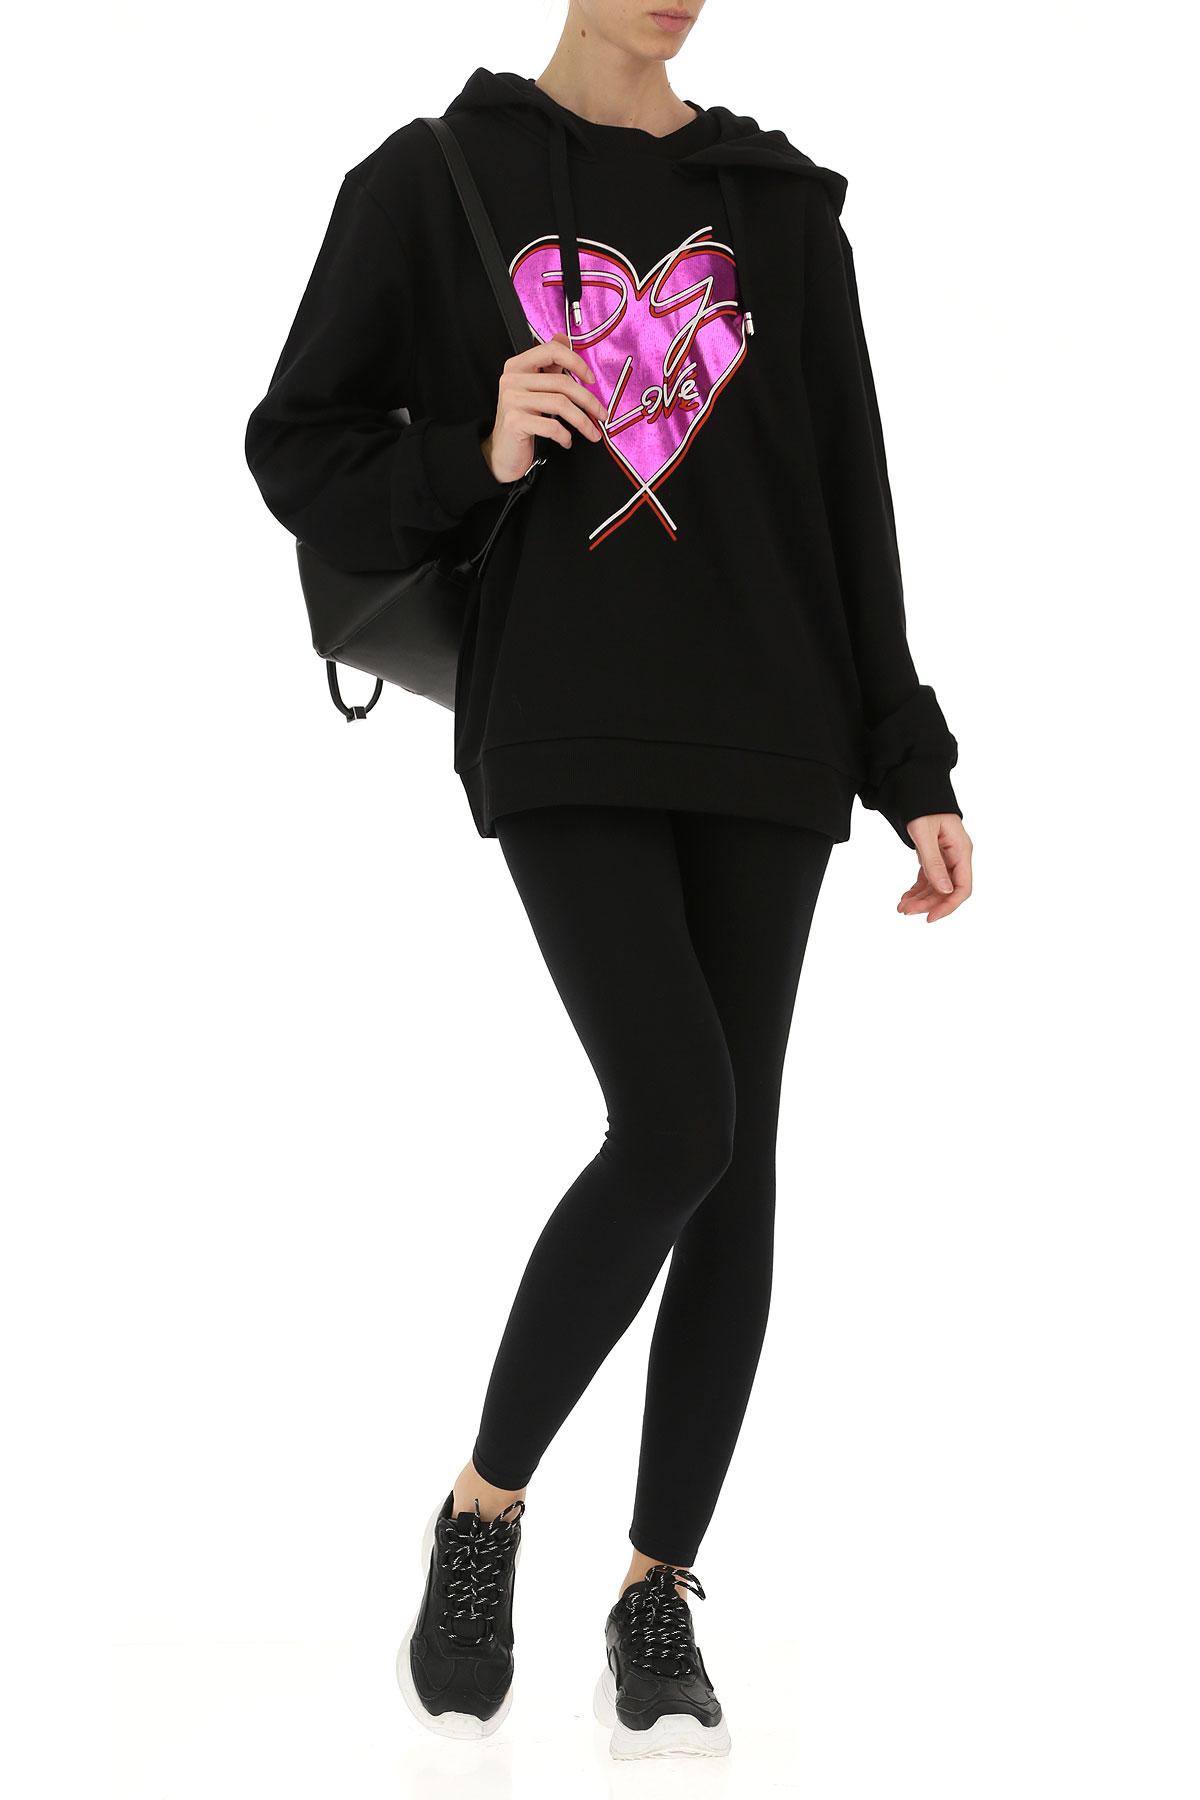 nbsp; verano Gabbana 2019 Mujer Negro Ropa Dolce Primavera amp; Para Pq7zz1